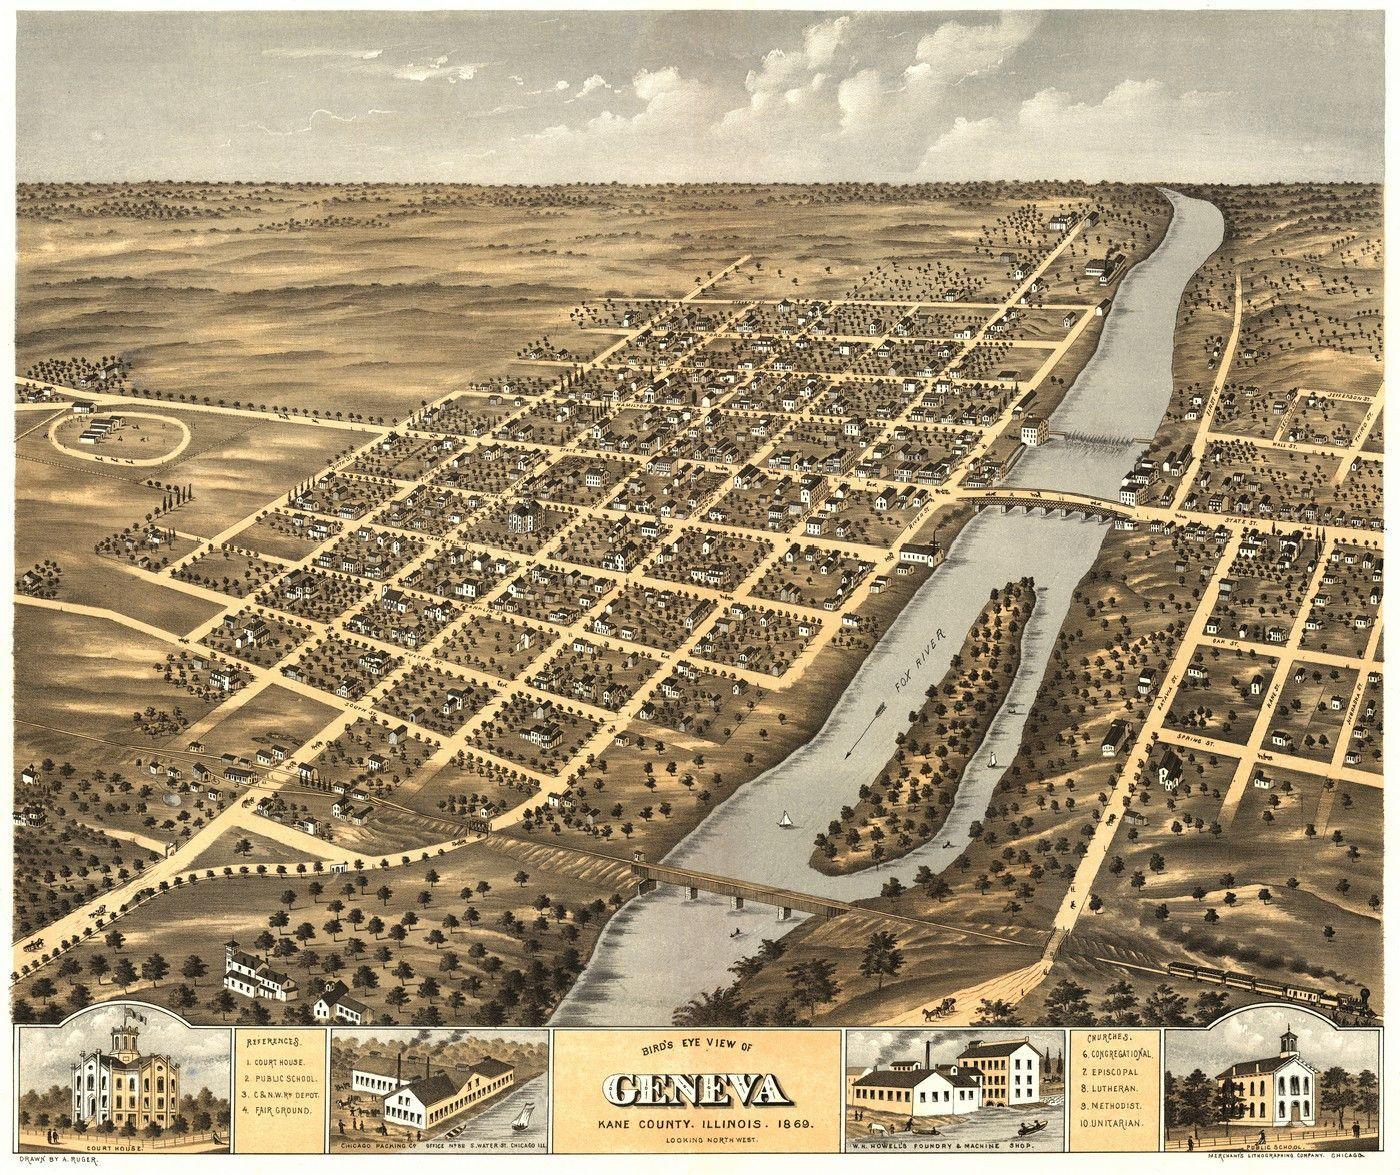 Illinois kane county carpentersville - Old Map Of Geneva Illinois 1869 Kane County Poster